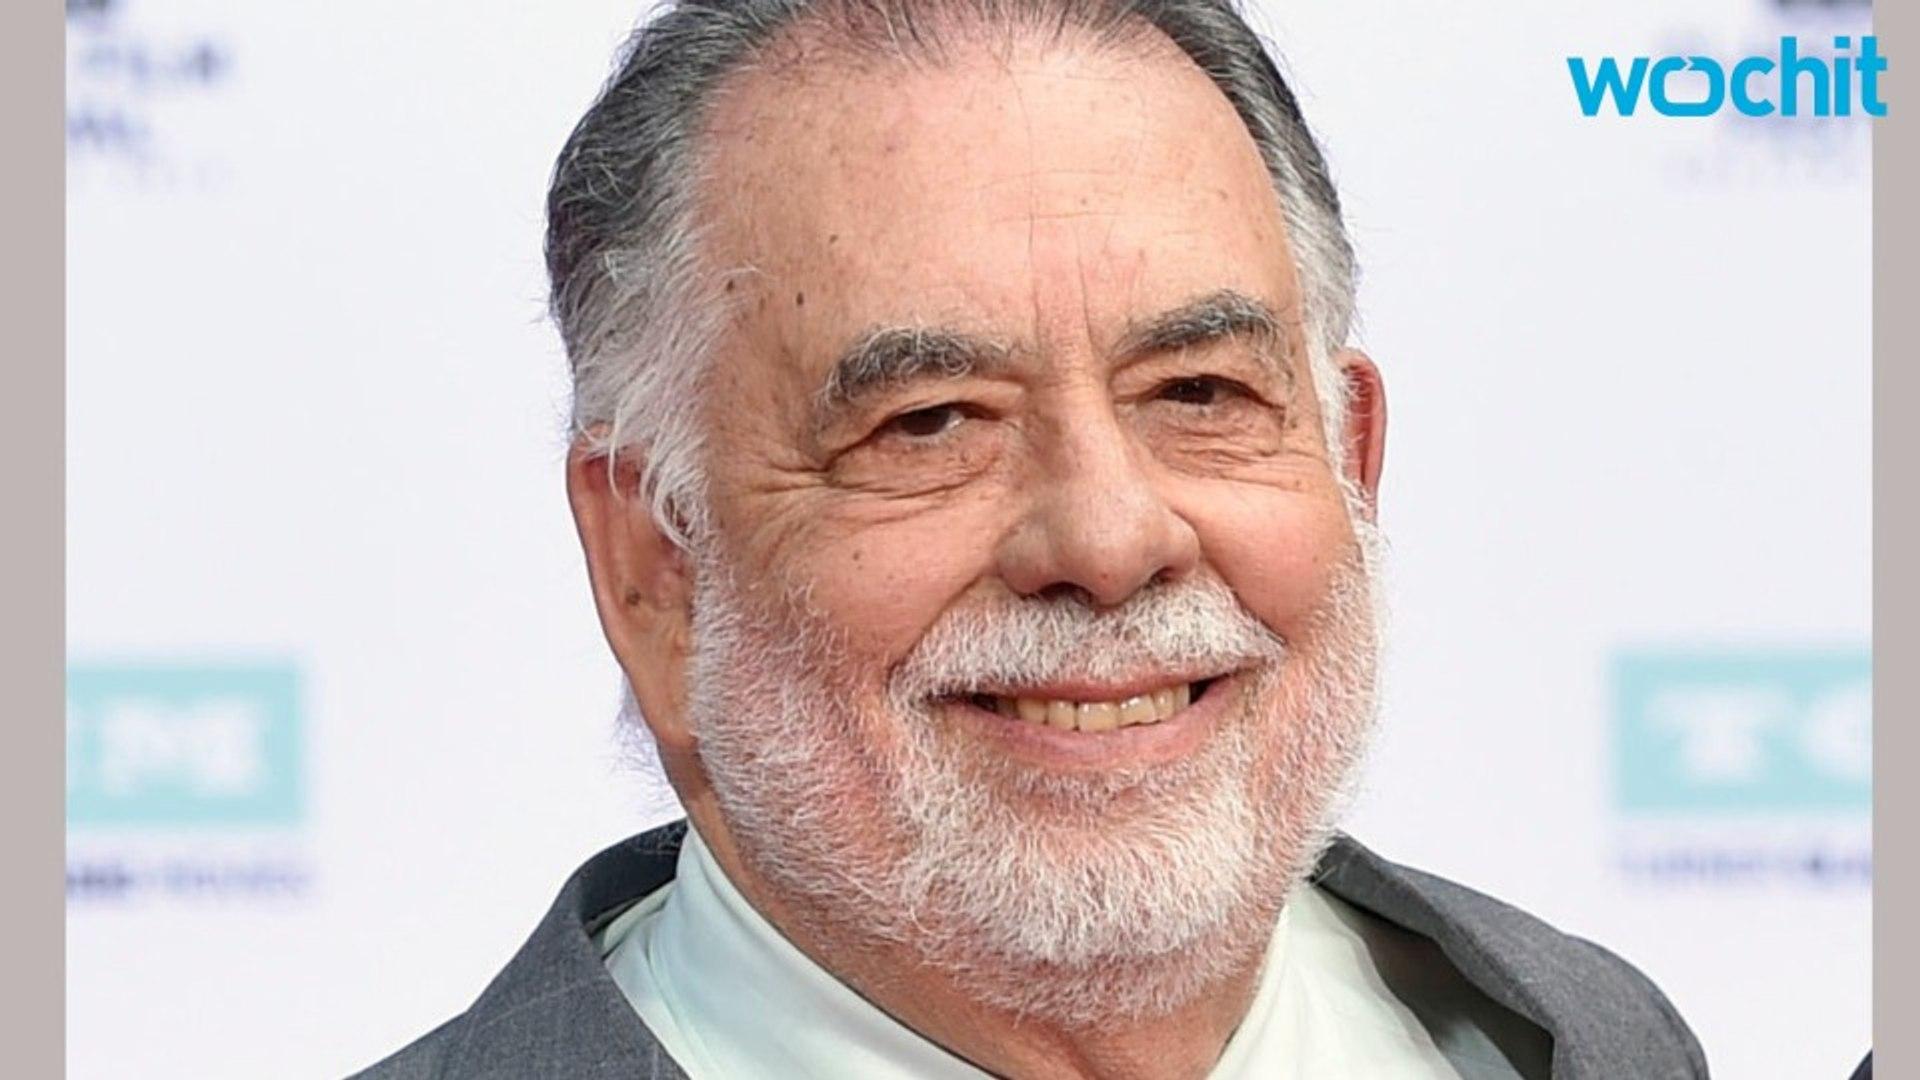 Francis Ford Coppola Hopes to Create 'Apocalypse Now' Video Game